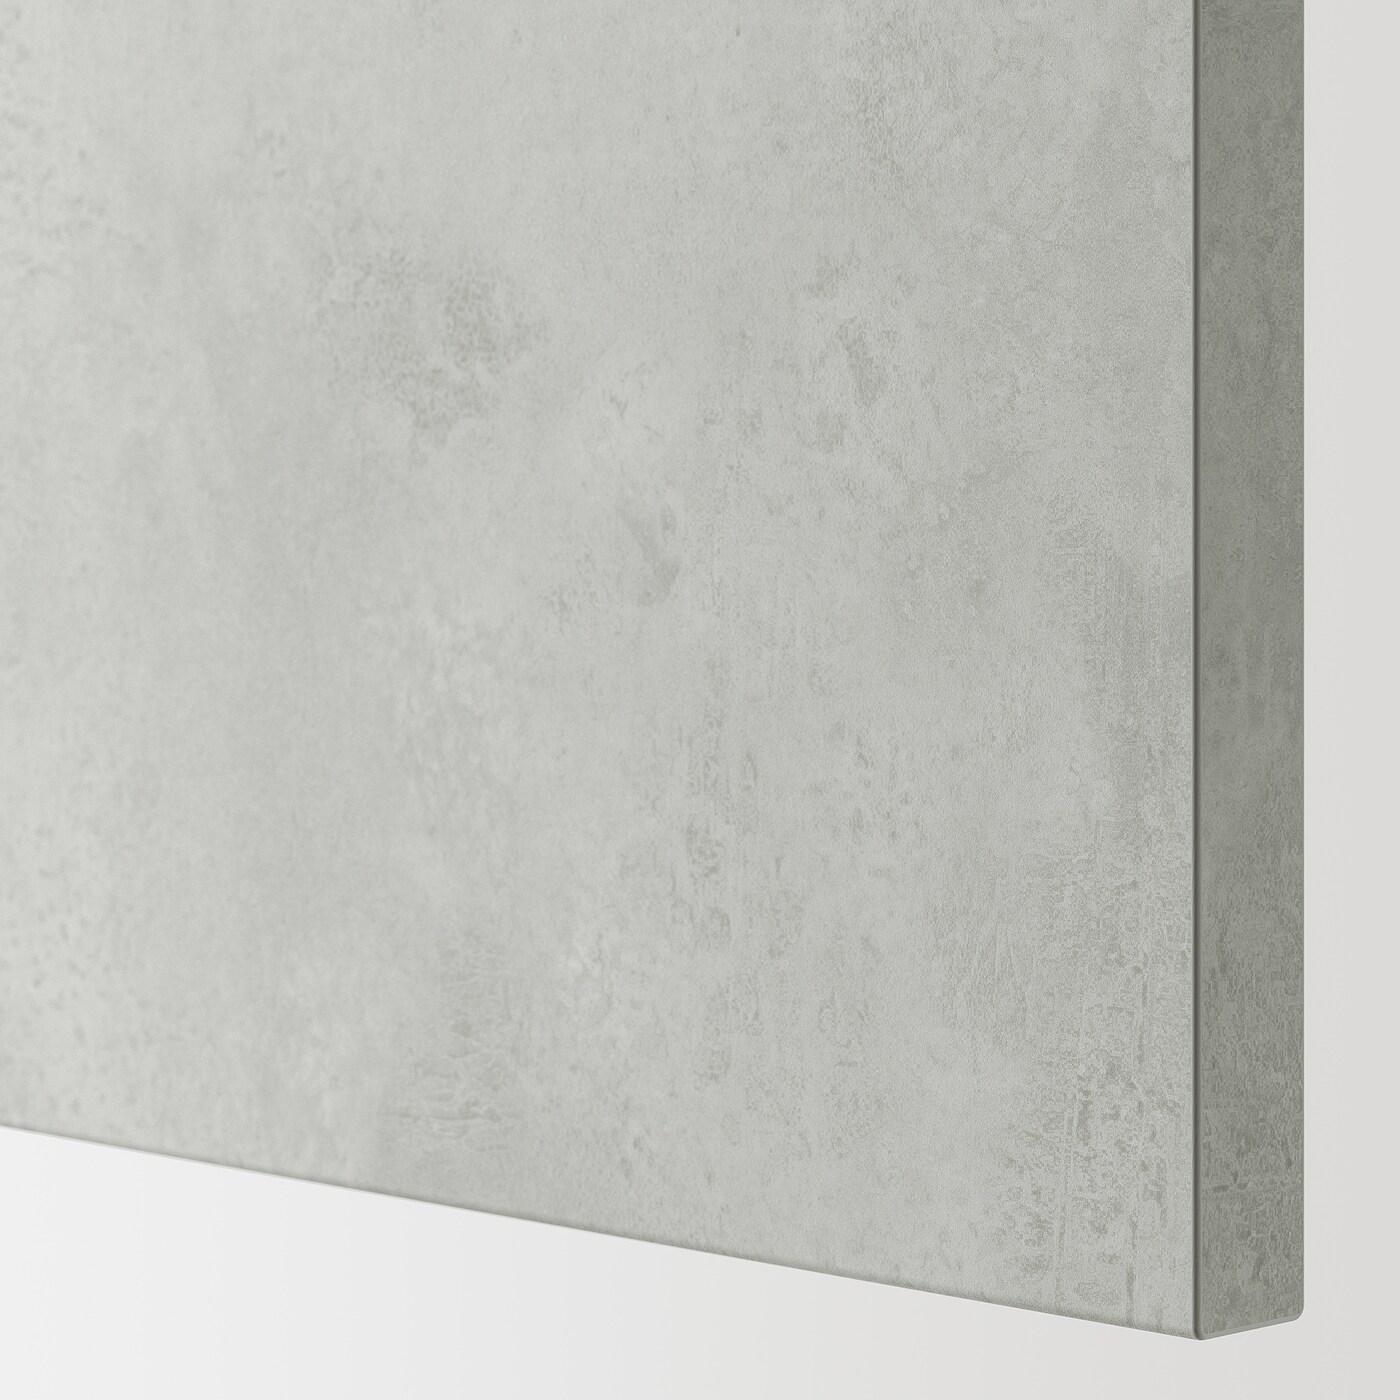 ENHET Wall cb w 2 shlvs/door, white/concrete effect, 40x32x75 cm